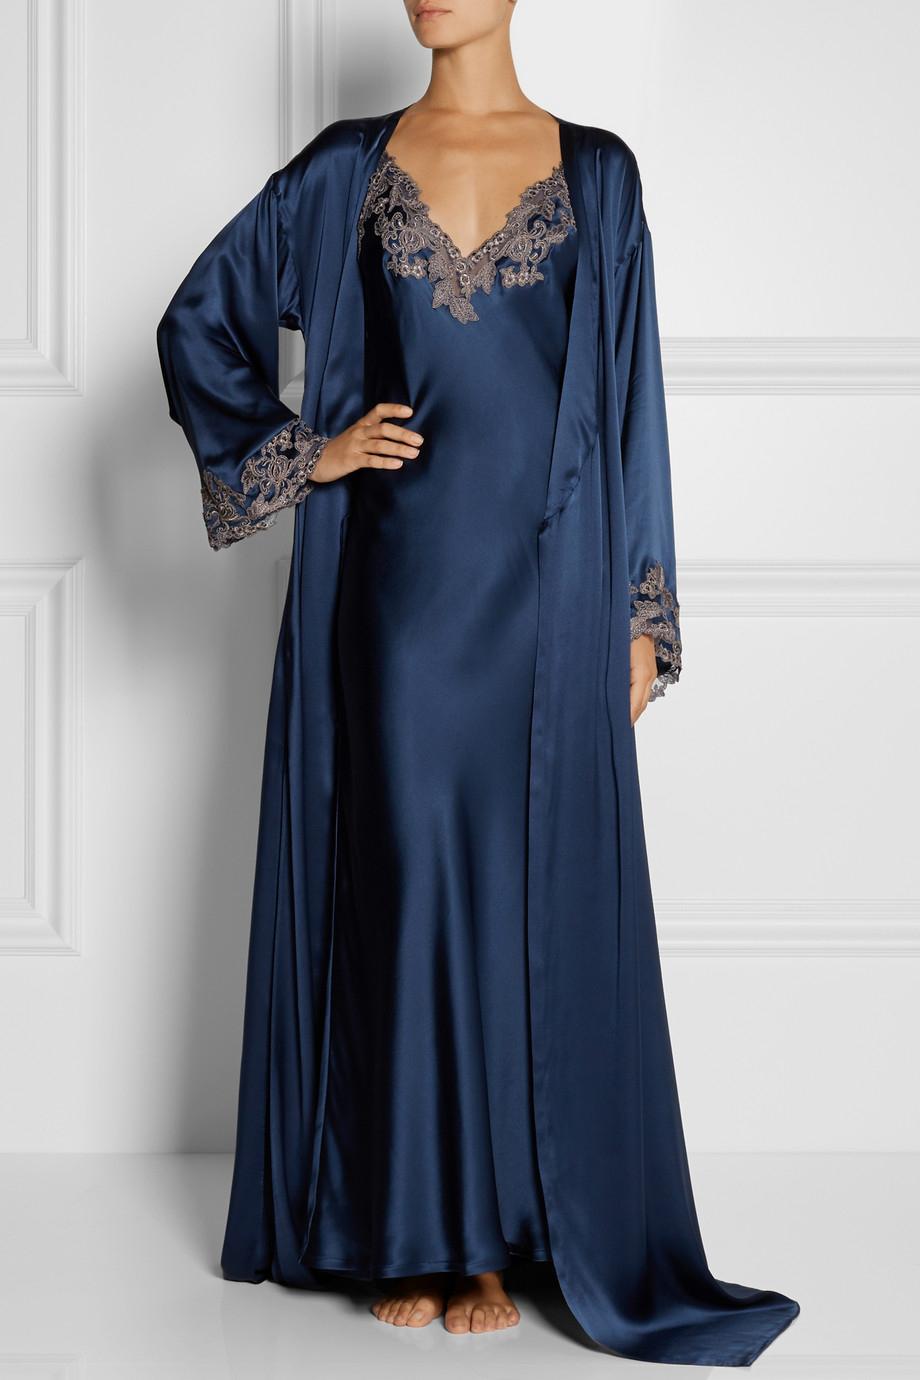 La Perla Maison Lace-Trimmed Silk-Satin Robe in Blue - Lyst